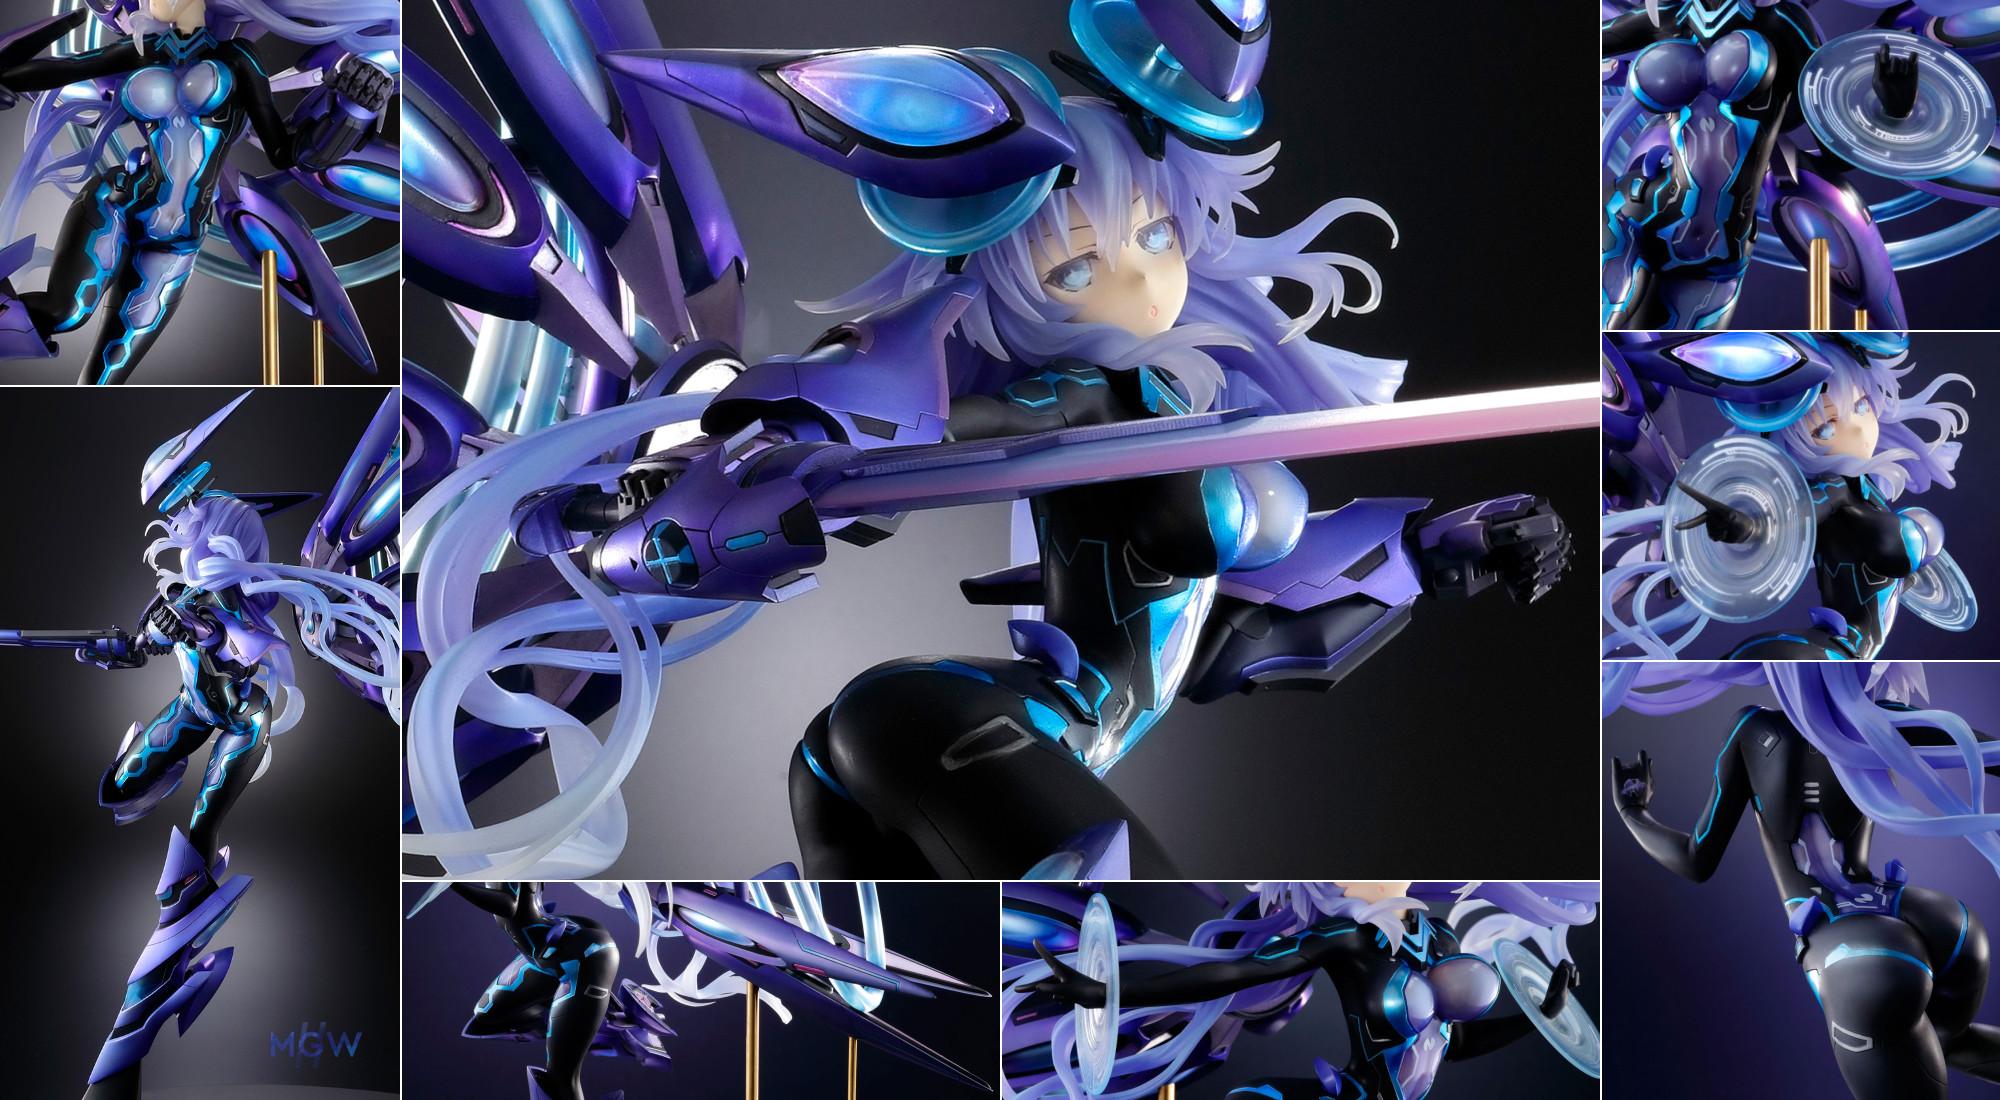 Hyperdimension Neptunia VII Next Purple by VERTEX MGW Anime Figure Pre order Guide